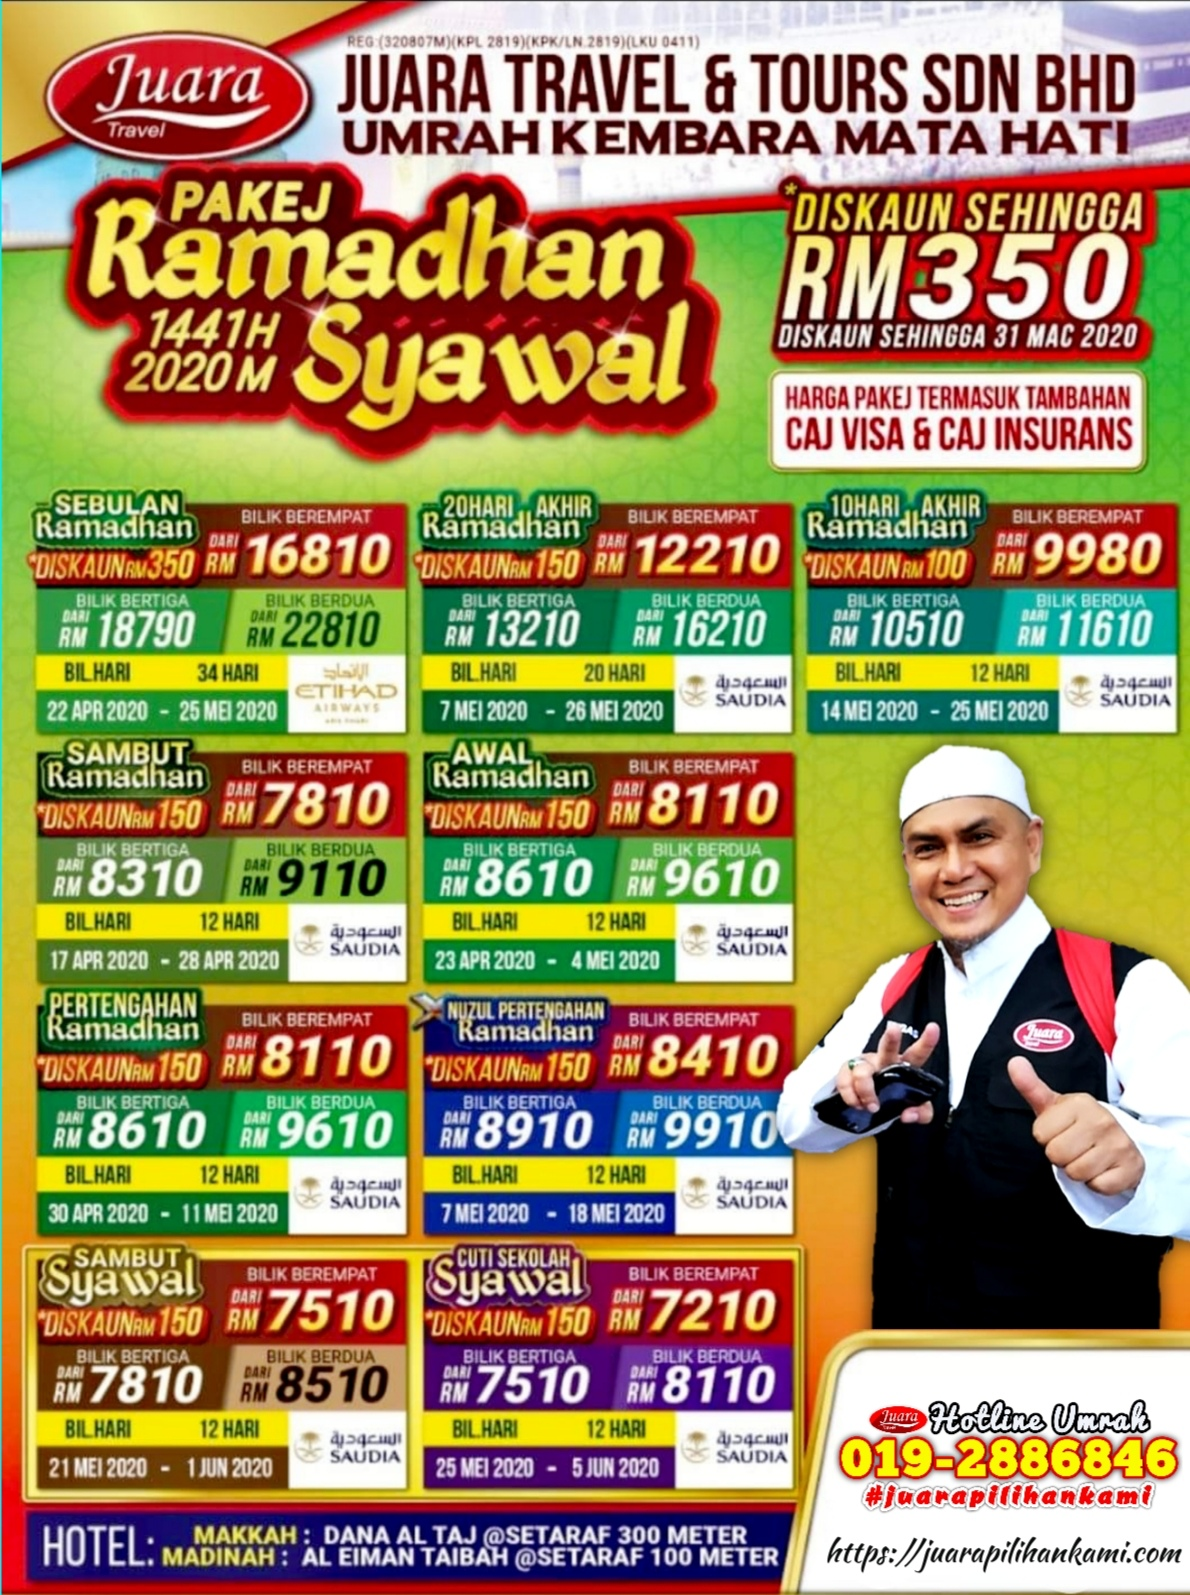 𝗞𝗘𝗠𝗕𝗔𝗥𝗔 𝗨𝗠𝗥𝗔𝗛 𝗠𝗔𝗧𝗔 𝗛𝗔𝗧𝗜 𝗜 𝗨𝗠𝗥𝗔𝗛 𝗕𝗘𝗥𝗟𝗔𝗡𝗗𝗔𝗦𝗞𝗔𝗡 𝗜𝗟𝗠𝗨 Pakej Umrah Ramadhan Syawal 2020